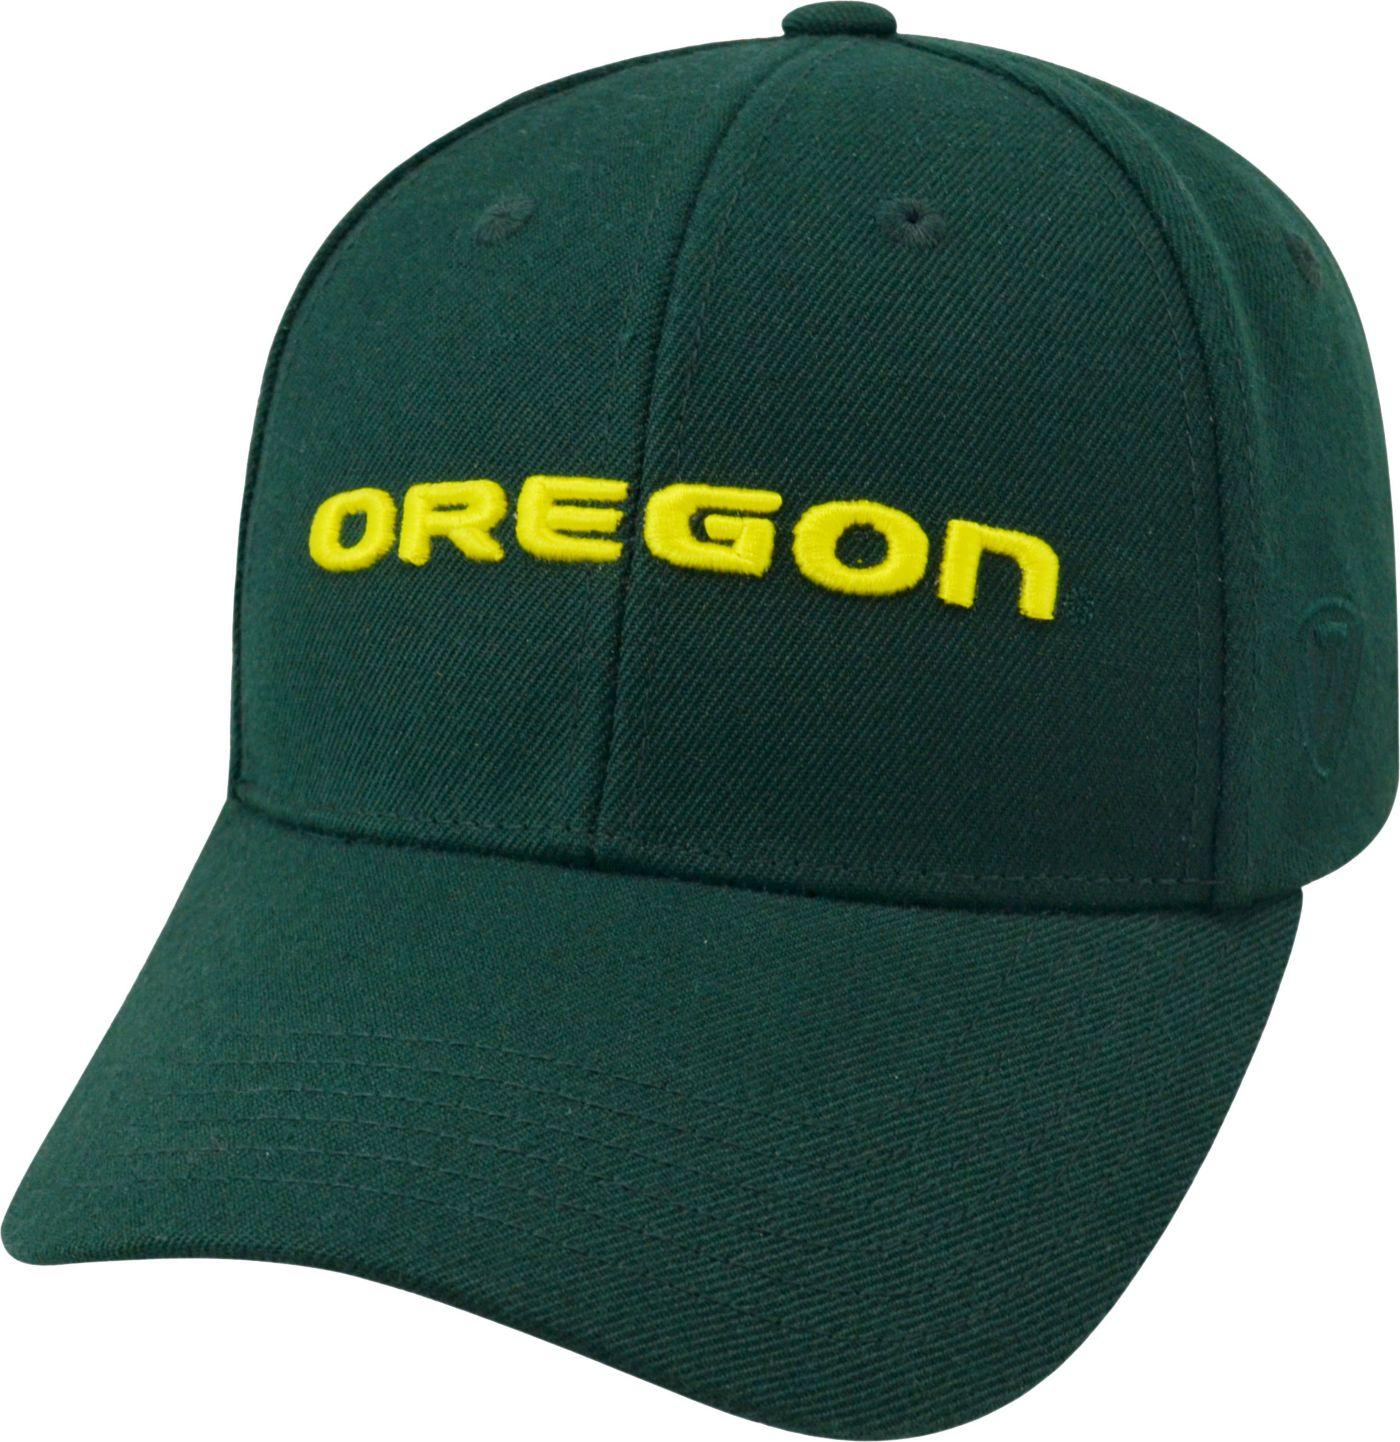 Top of the World Men's Oregon Ducks Green Premium Collection Adjustable Hat